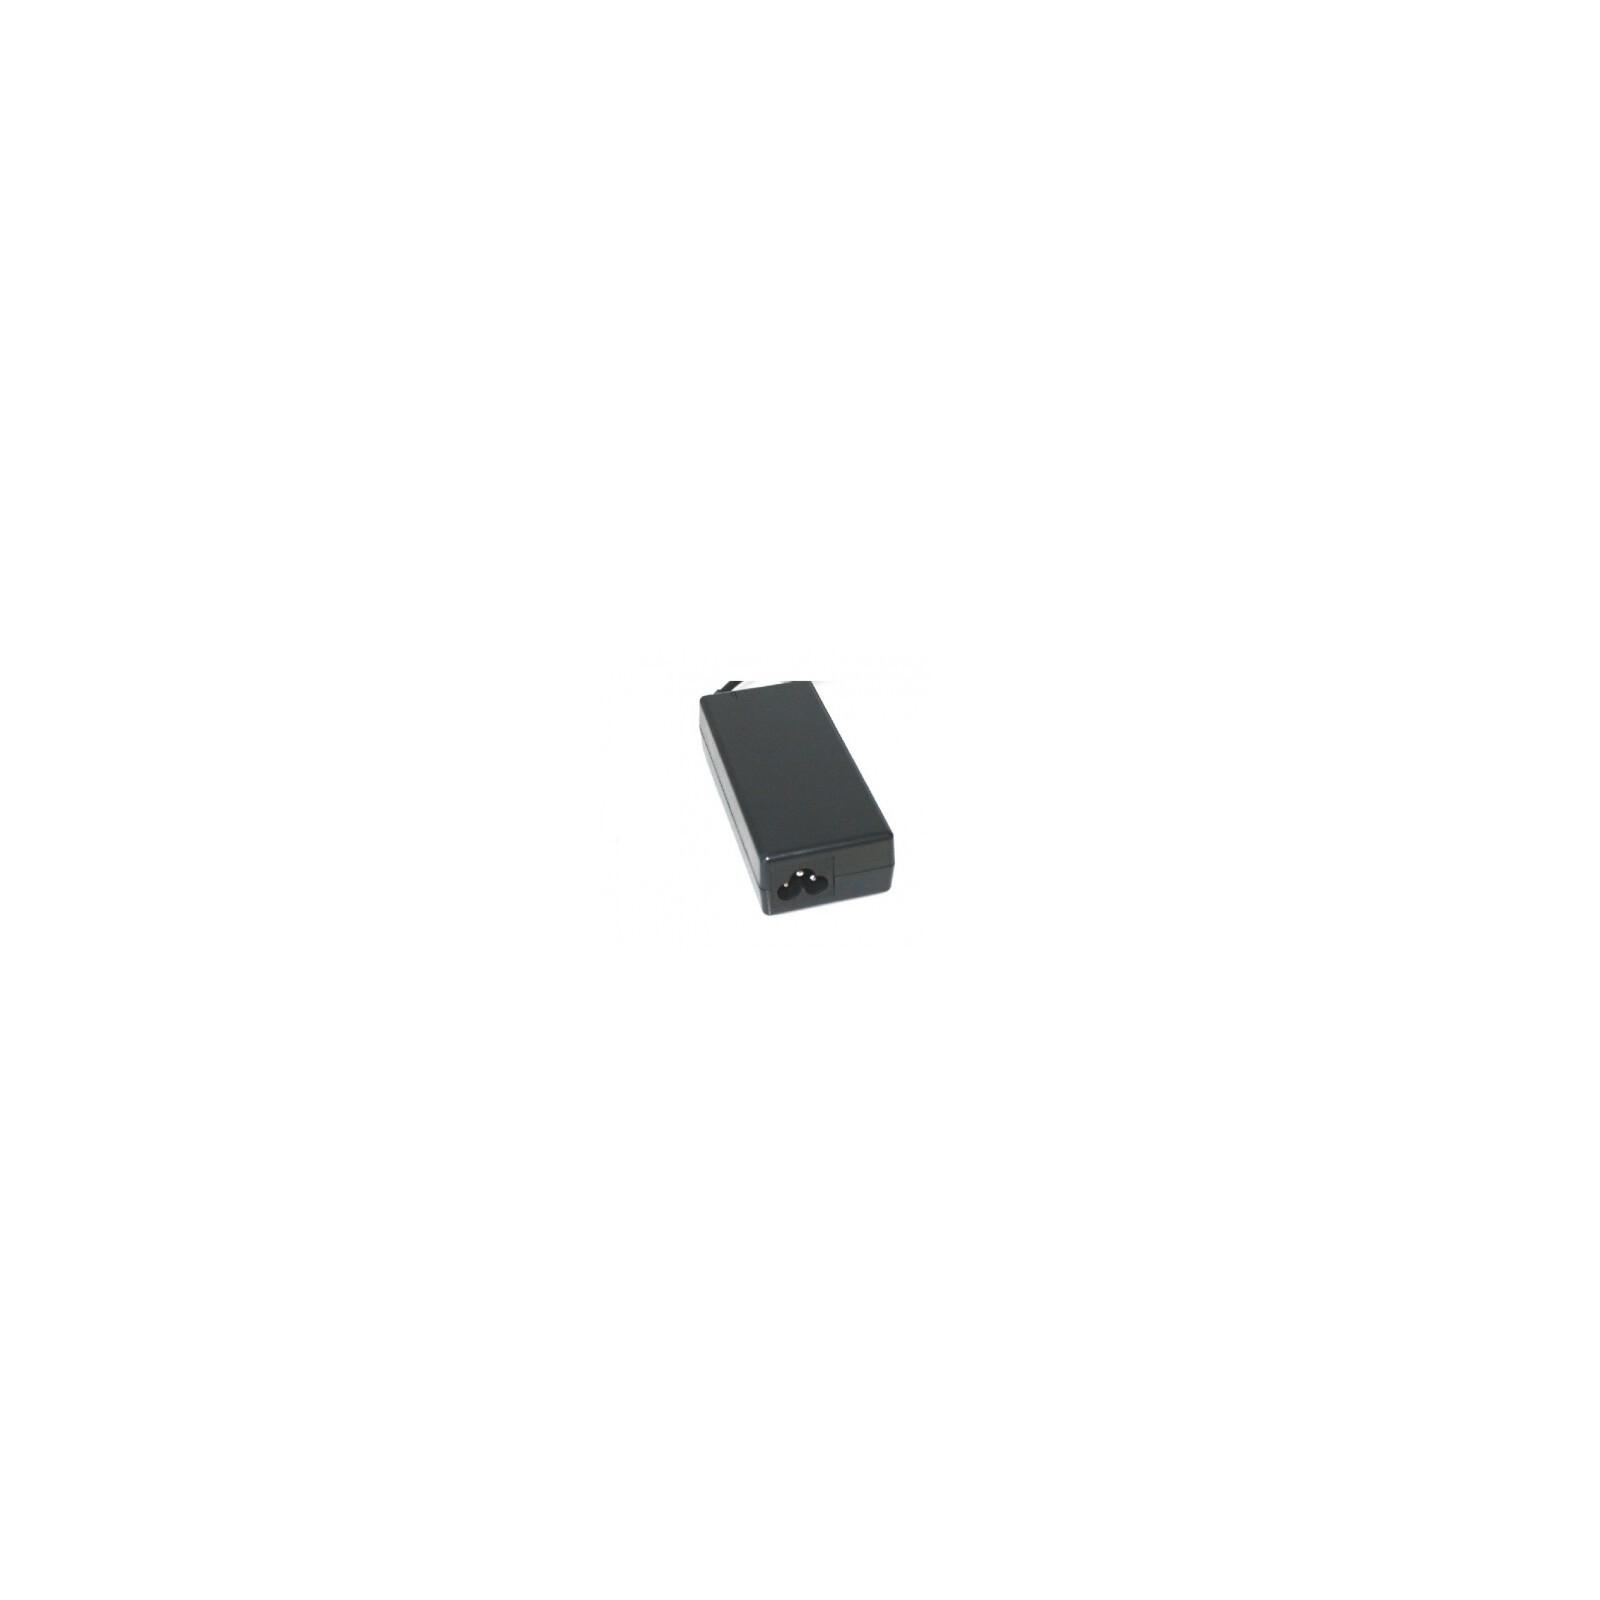 AGI Netzteil Acer Aspire 5538 65W